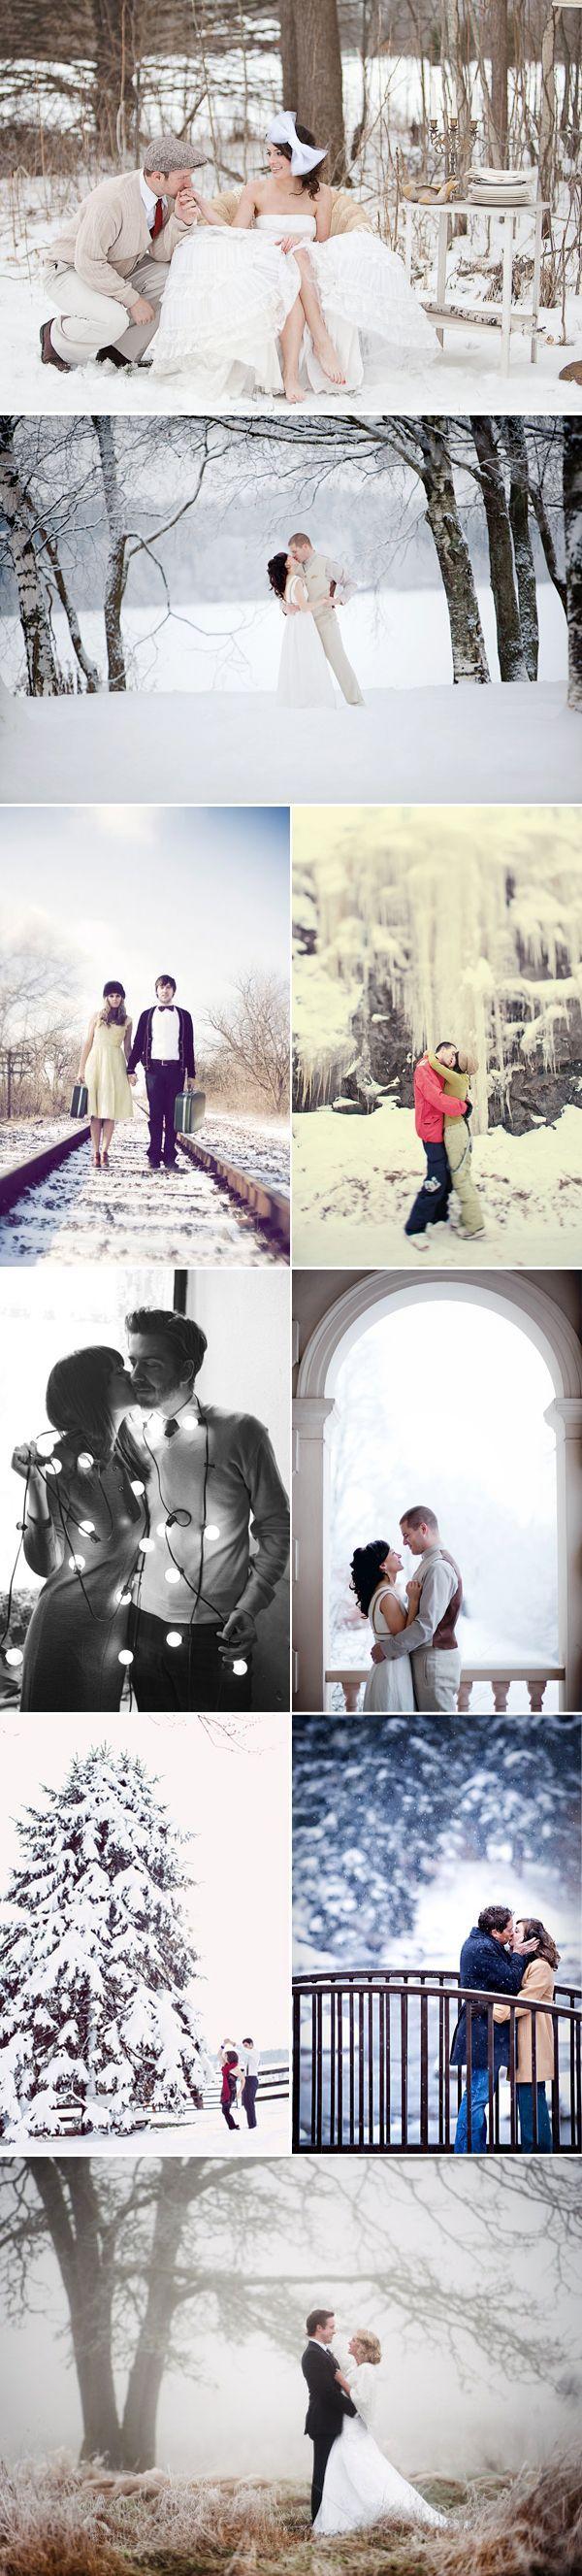 31 Winter Engagement Photos - Praise Wedding